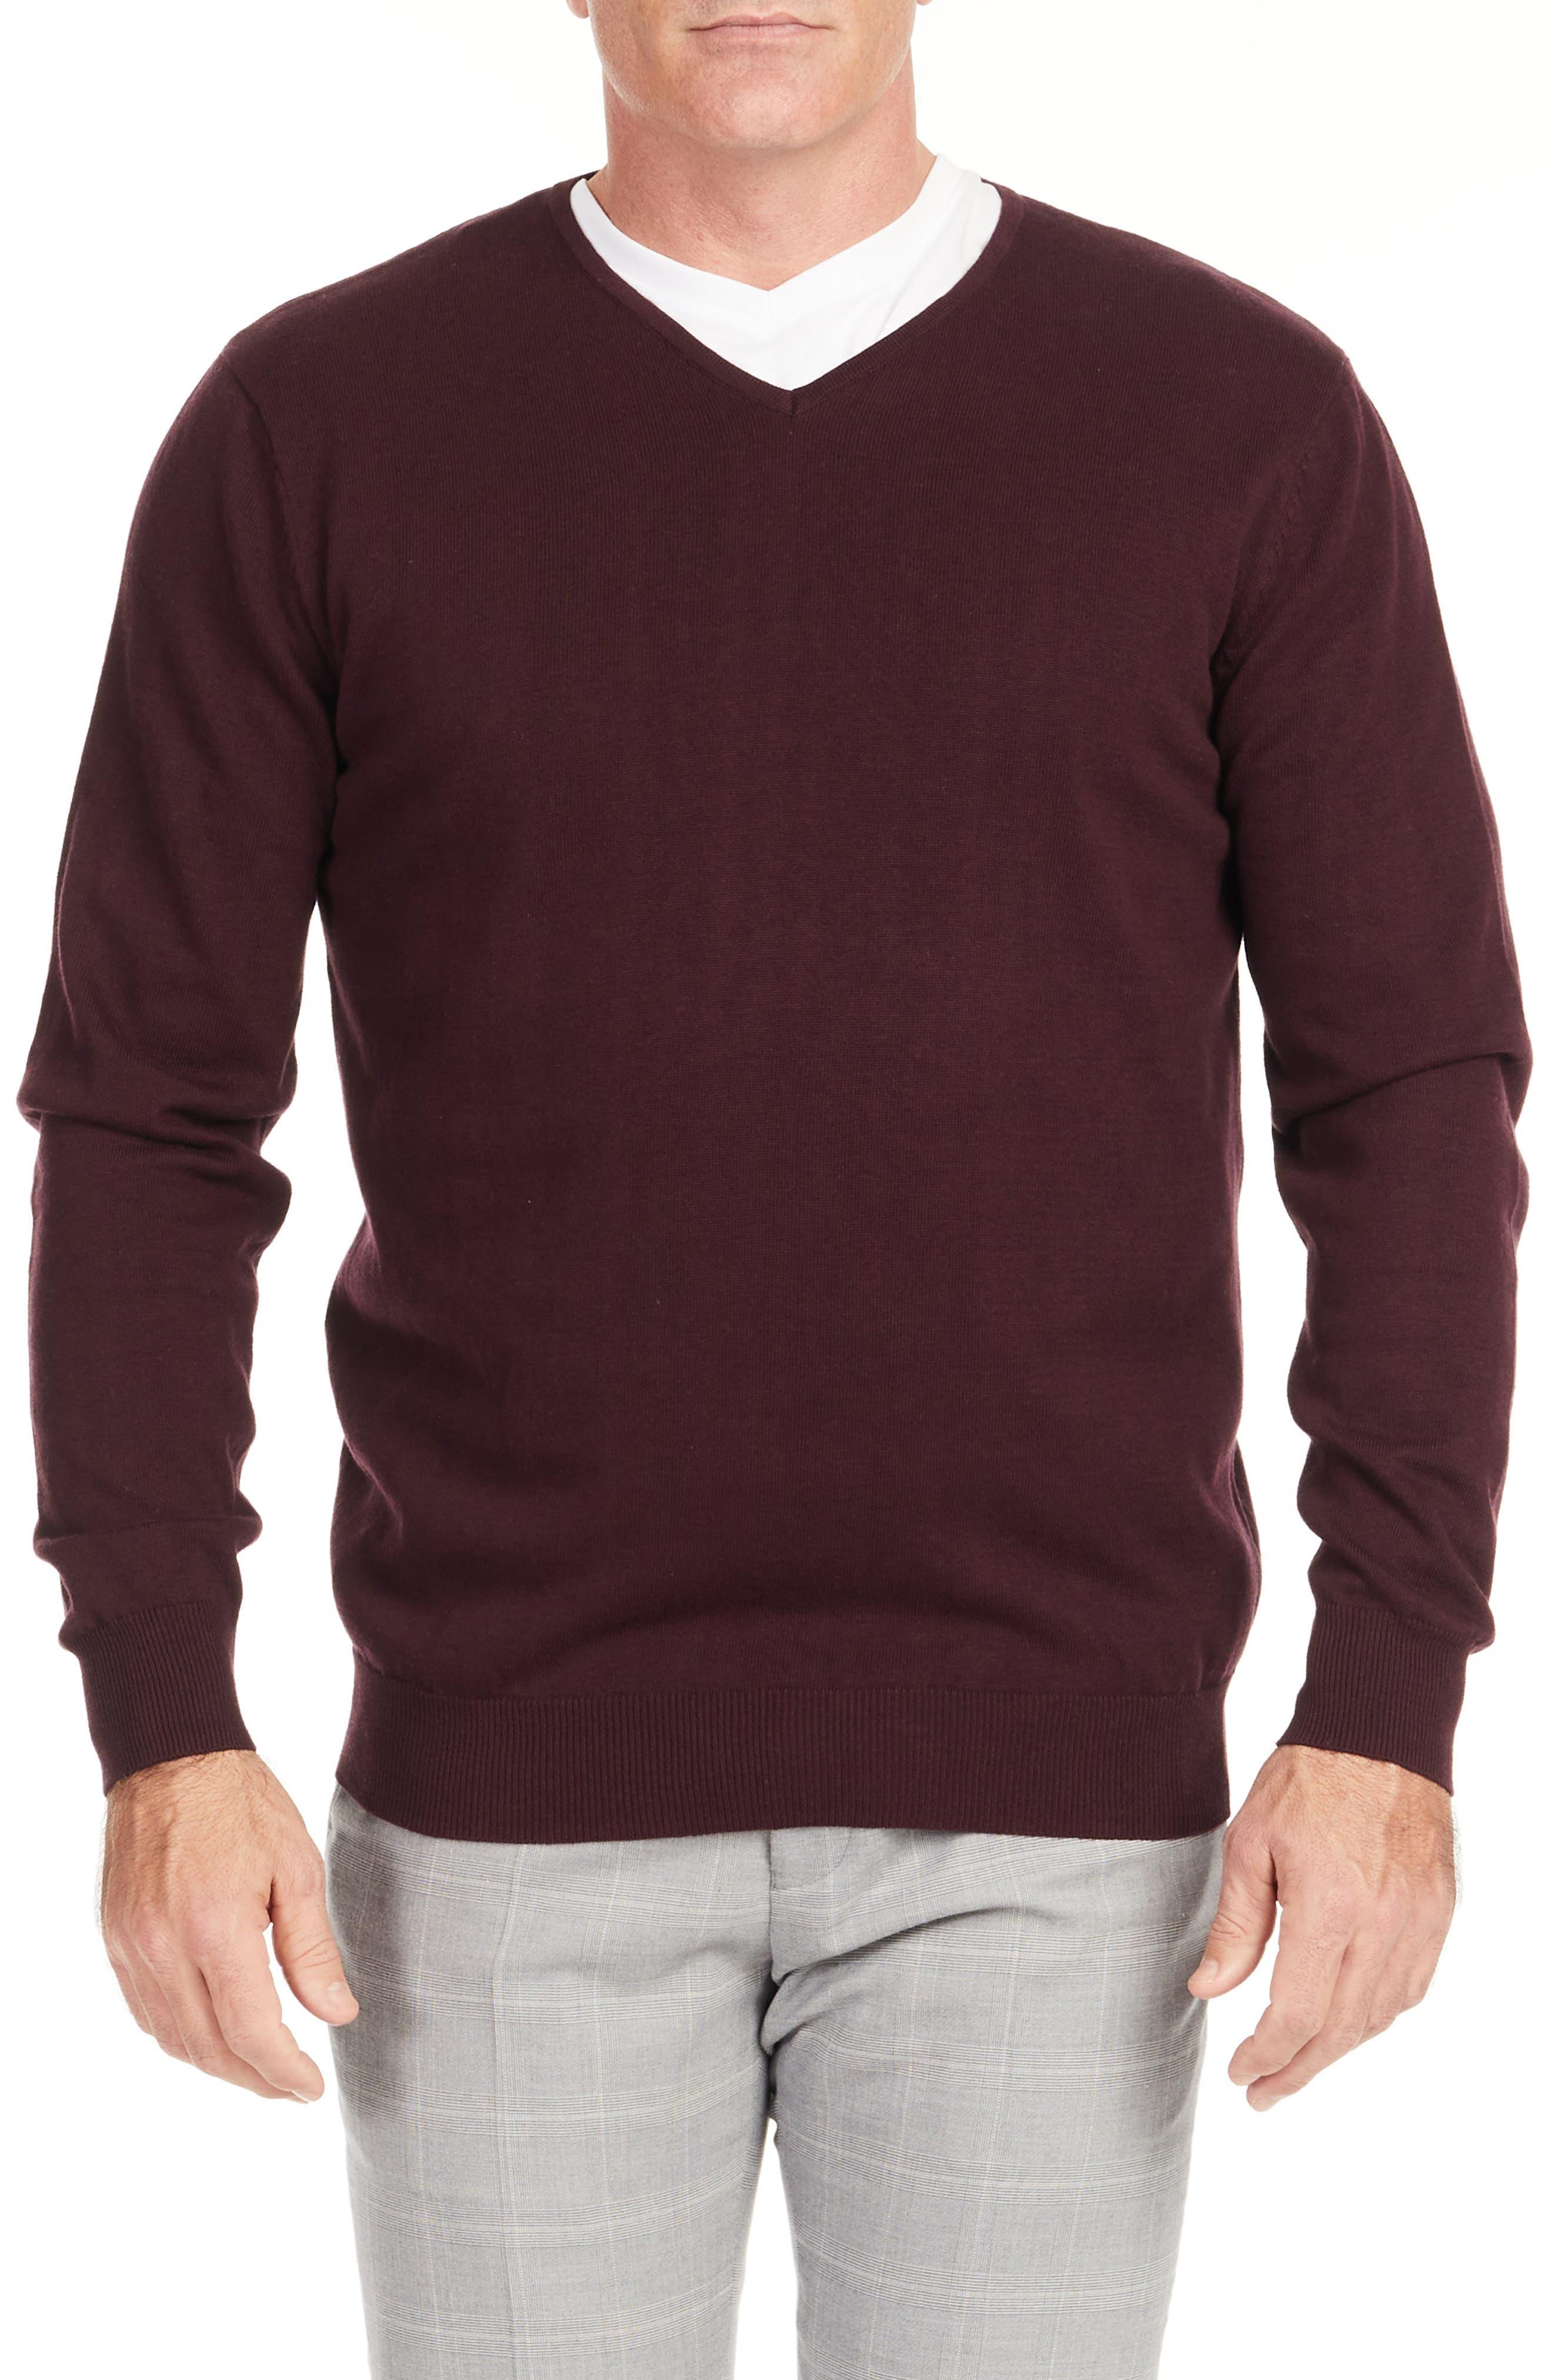 Essential V-Neck Cotton Sweater